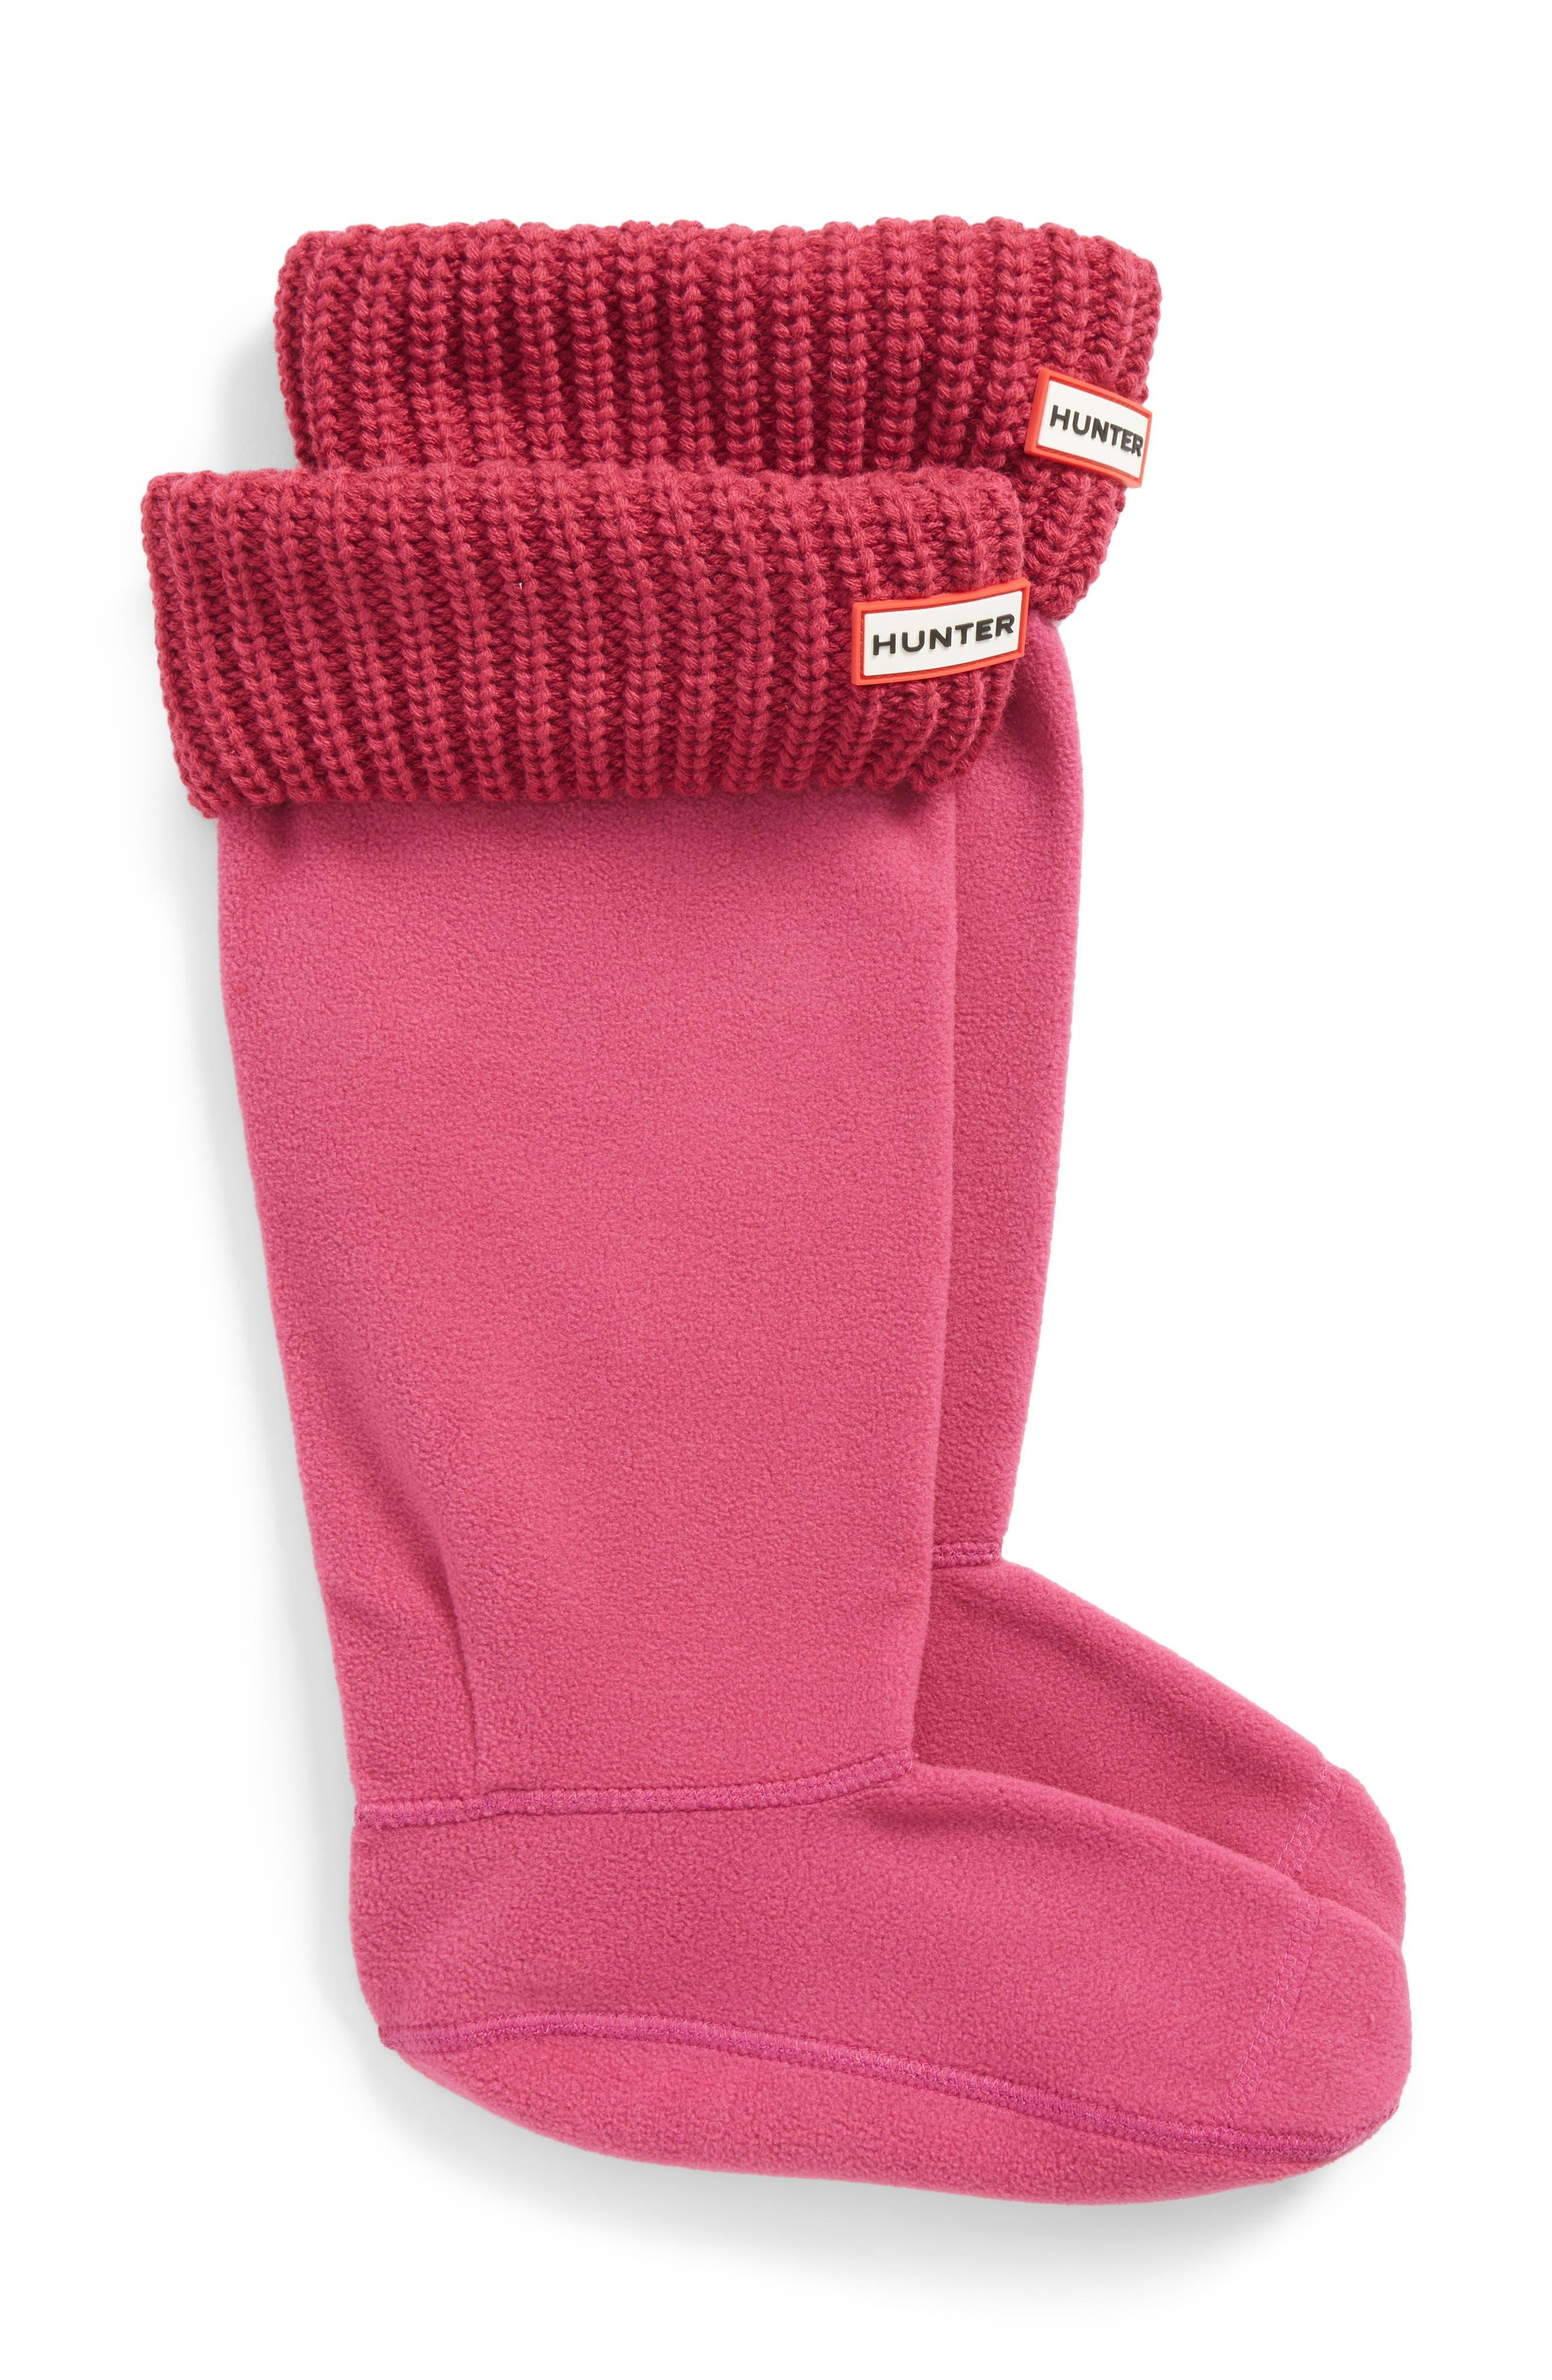 Main Image - Hunter Tall Cardigan Knit Cuff Welly Boot Socks